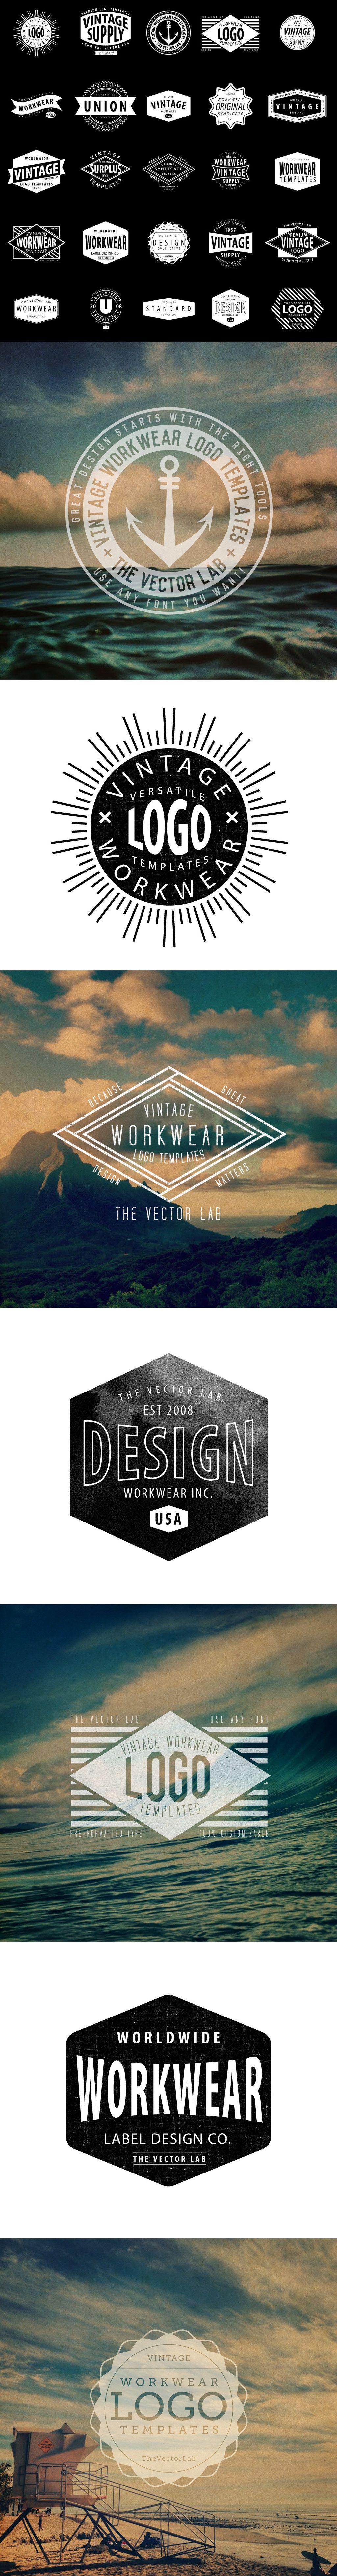 Logo Templates: Vintage Workwear | Logo templates, Adobe ...